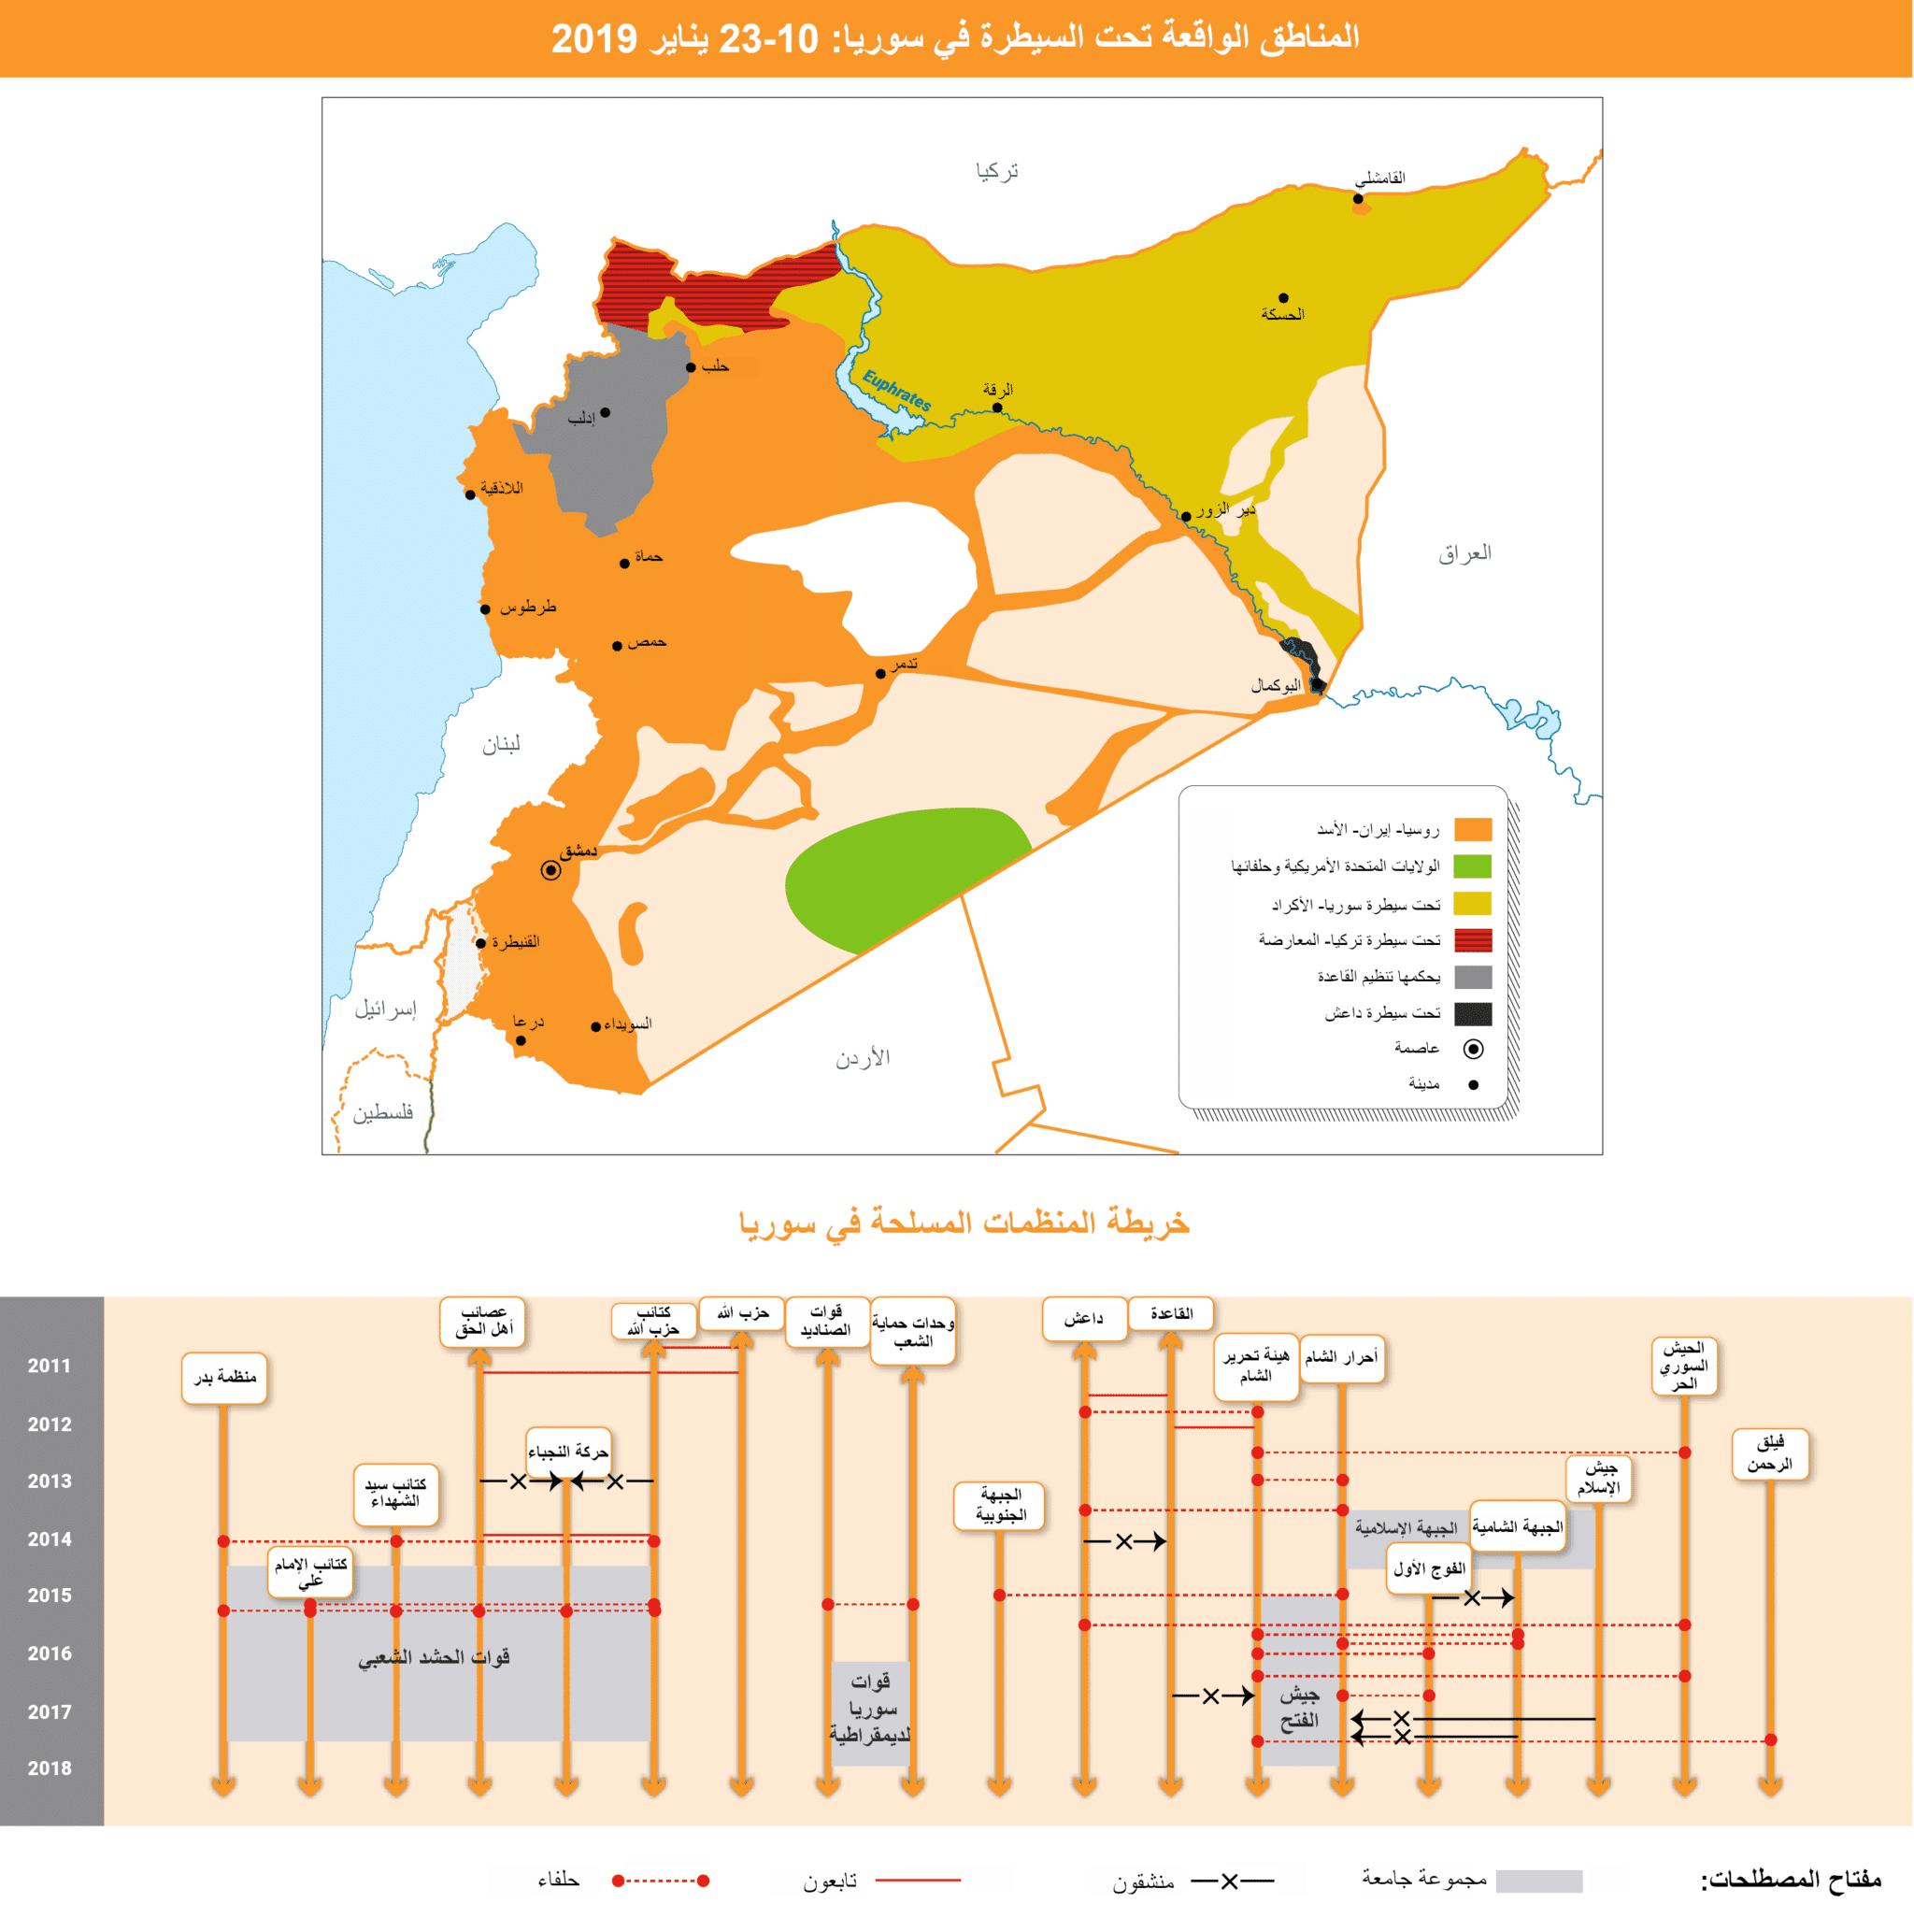 Syria Terrain Control and Militants 3000 AR